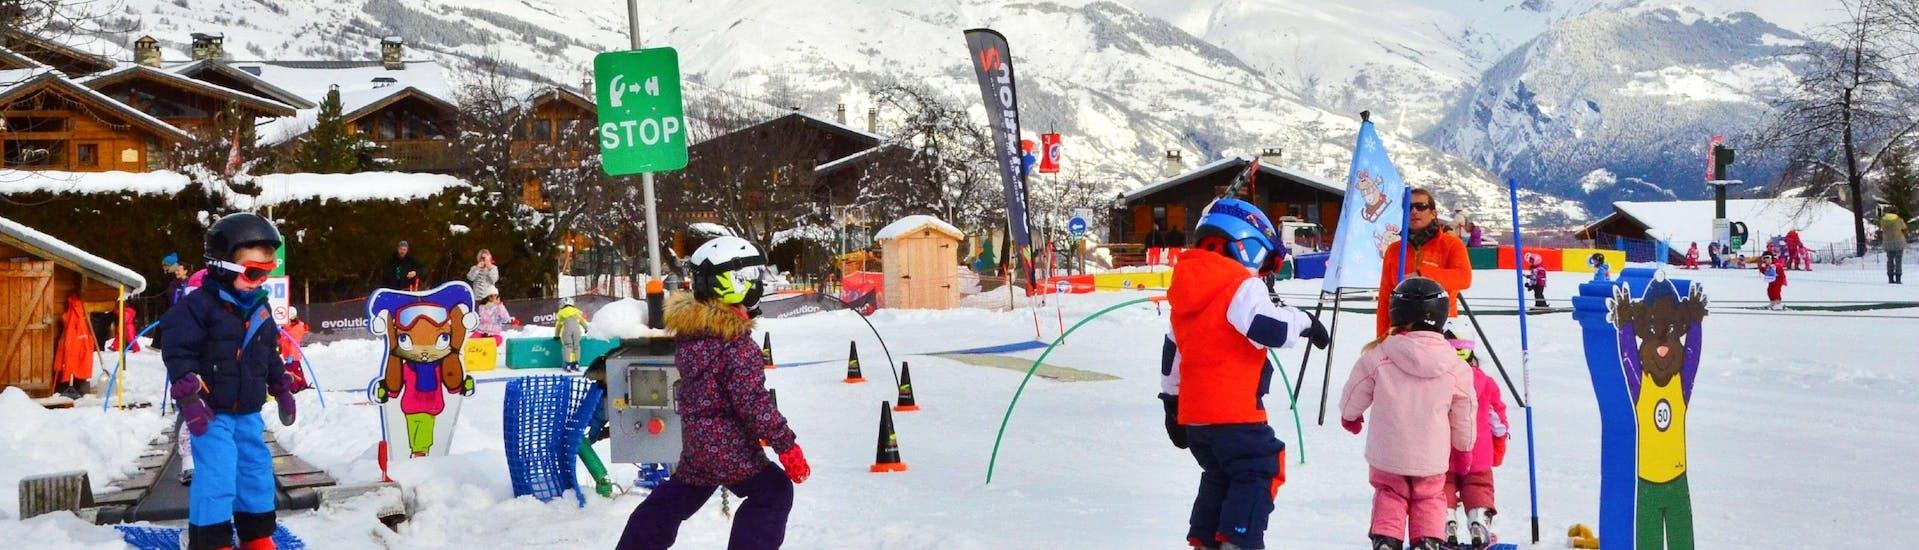 kids-ski-lessons-3-4-y-for-first-timers-evo2-la-plagne-hero